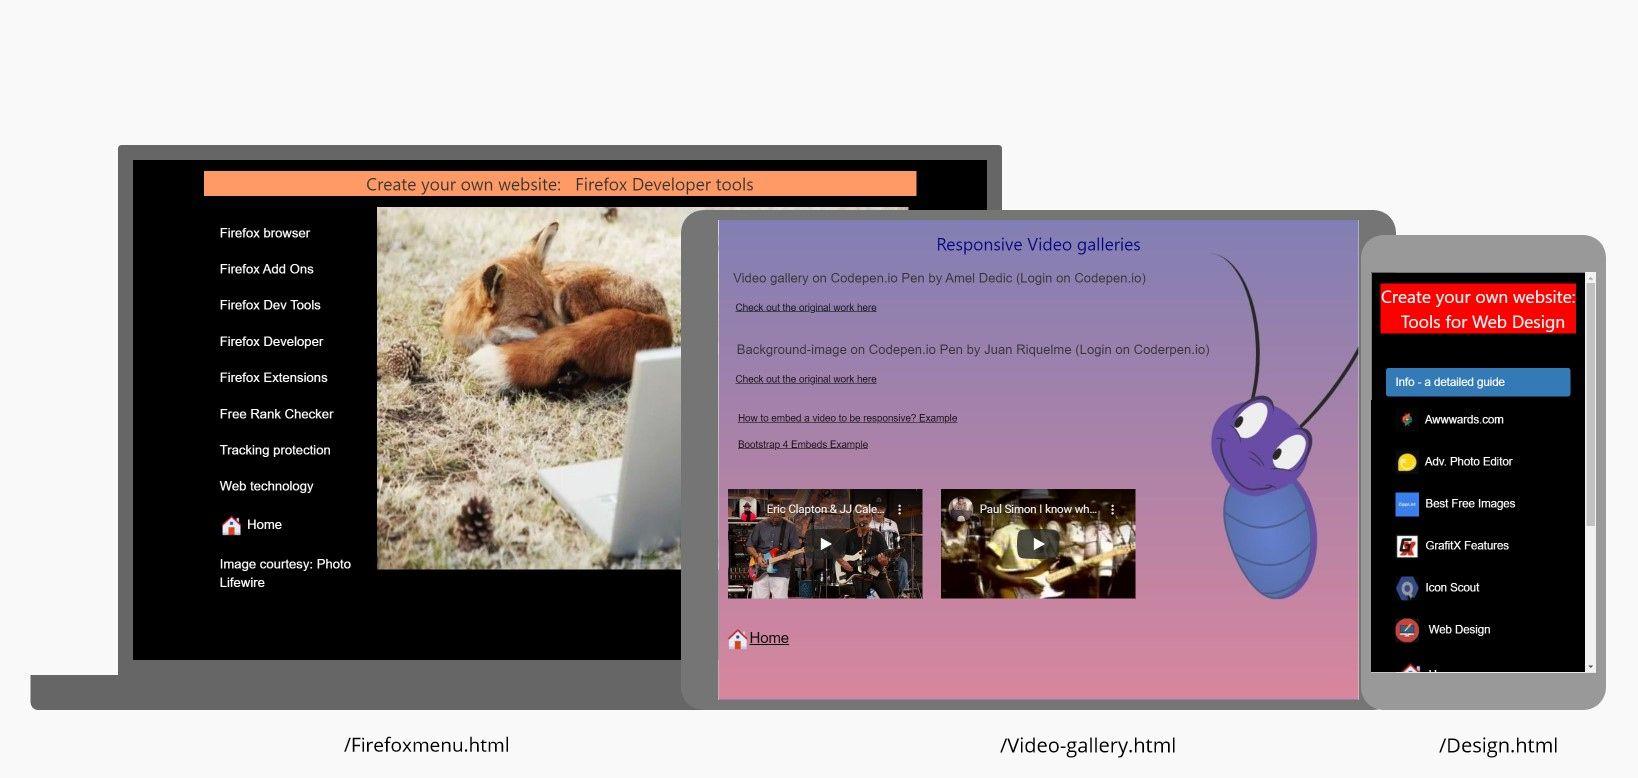 Firefoxmenu.html - Video-gallery.html - Webdesign.html